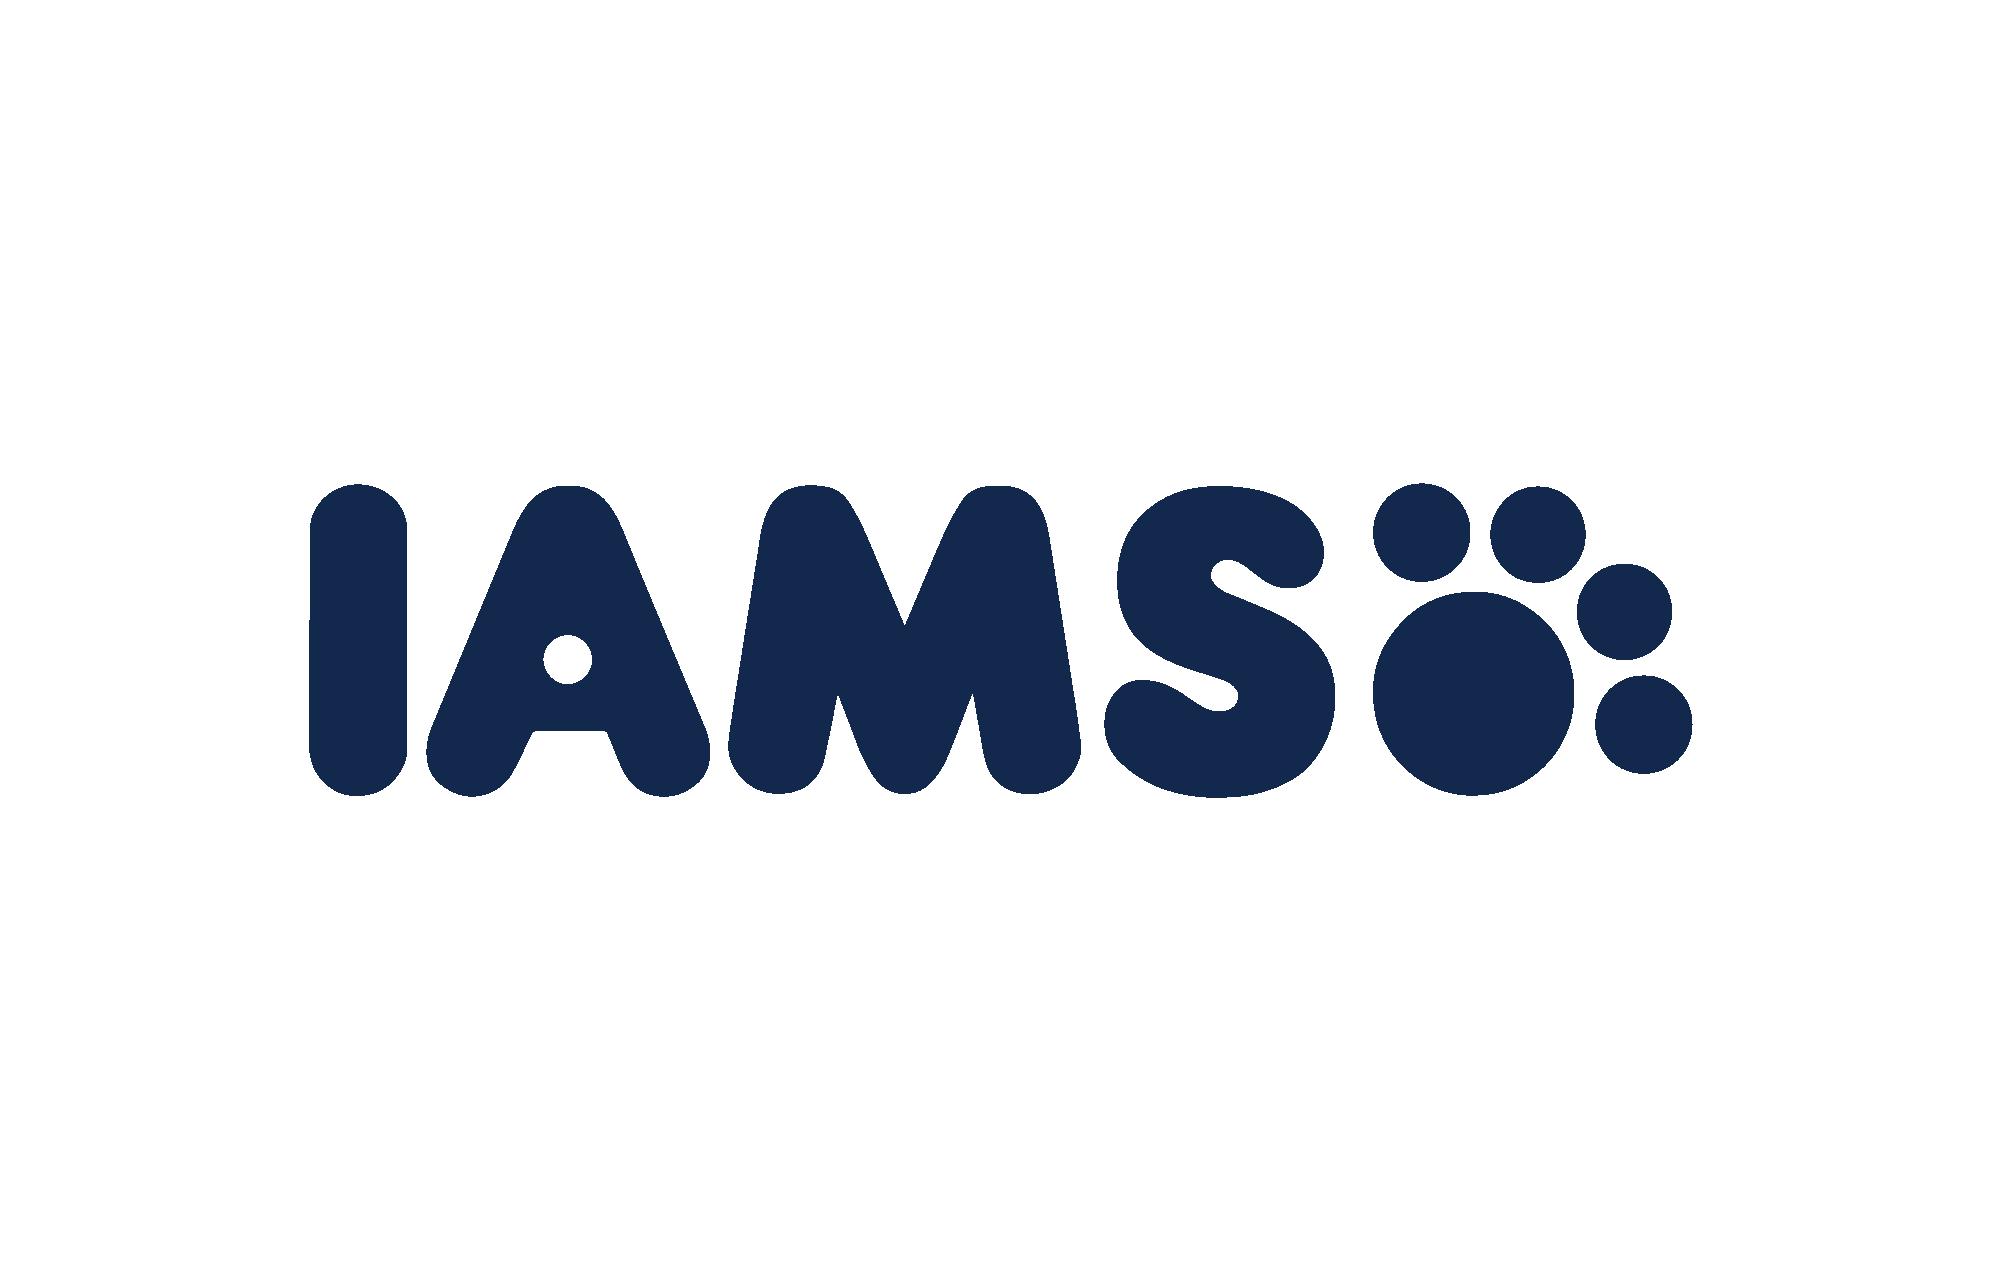 Blue IAMS logo